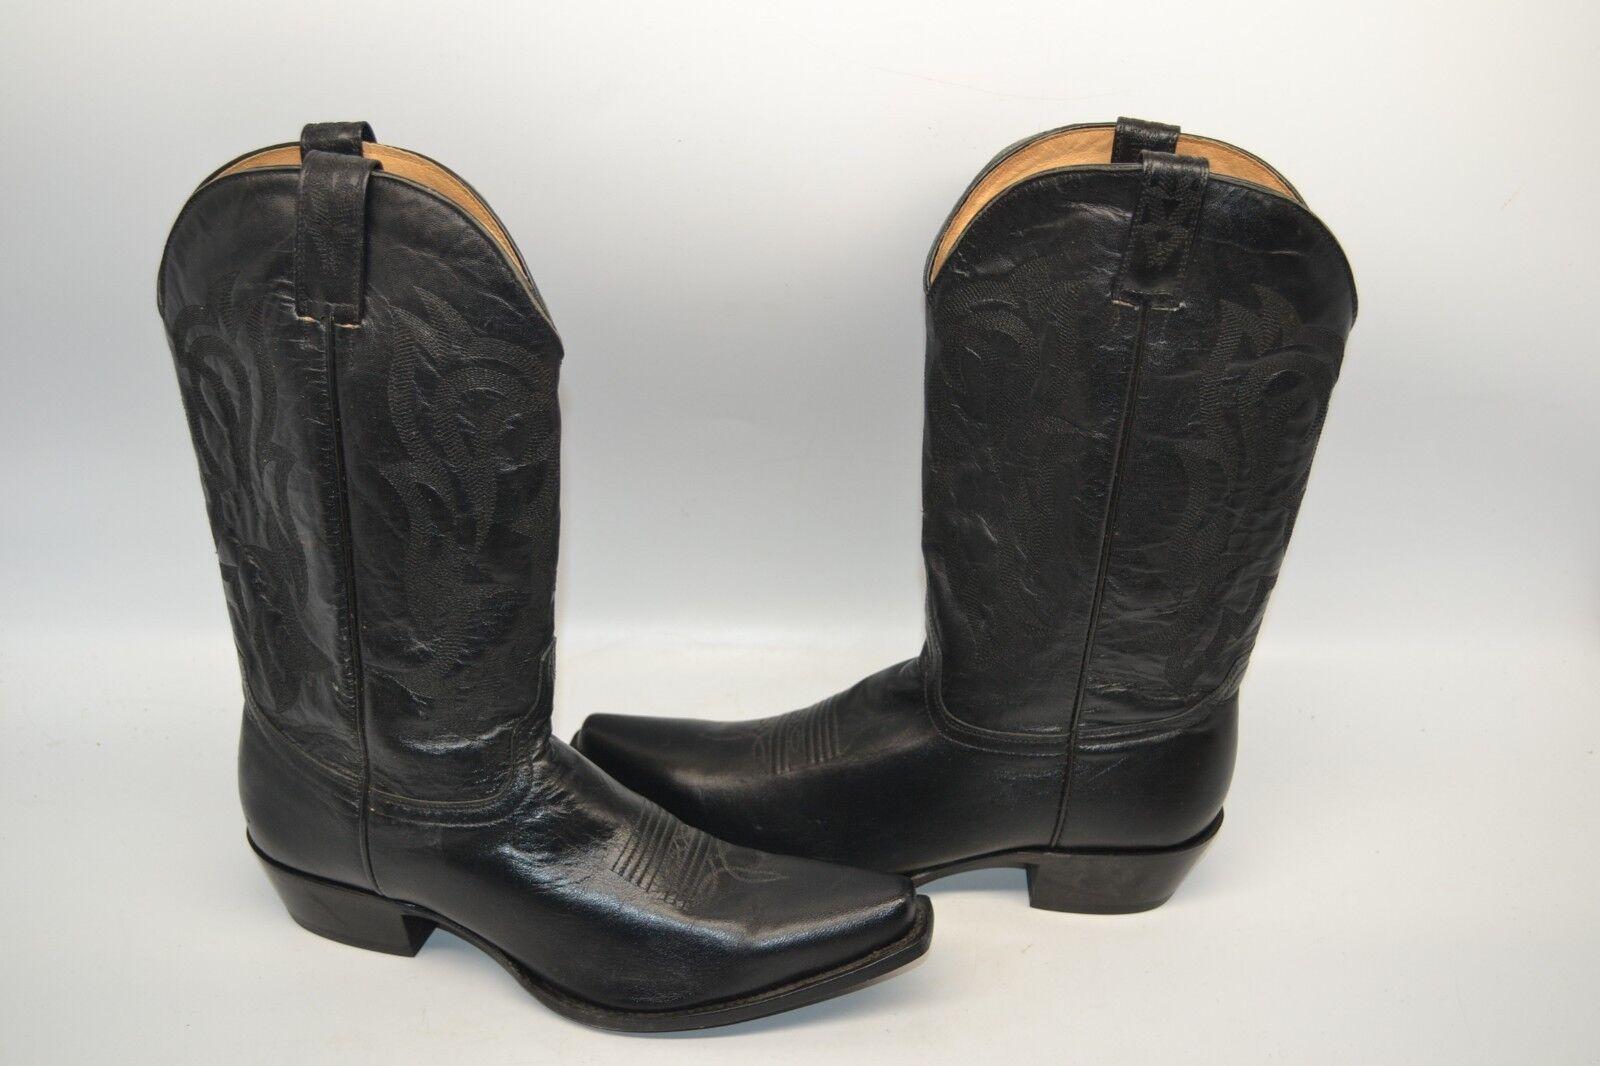 Shyanne Women's black RIDING WESTERN COWGIRL Boot SZ 10 B Snip Toe BBW113